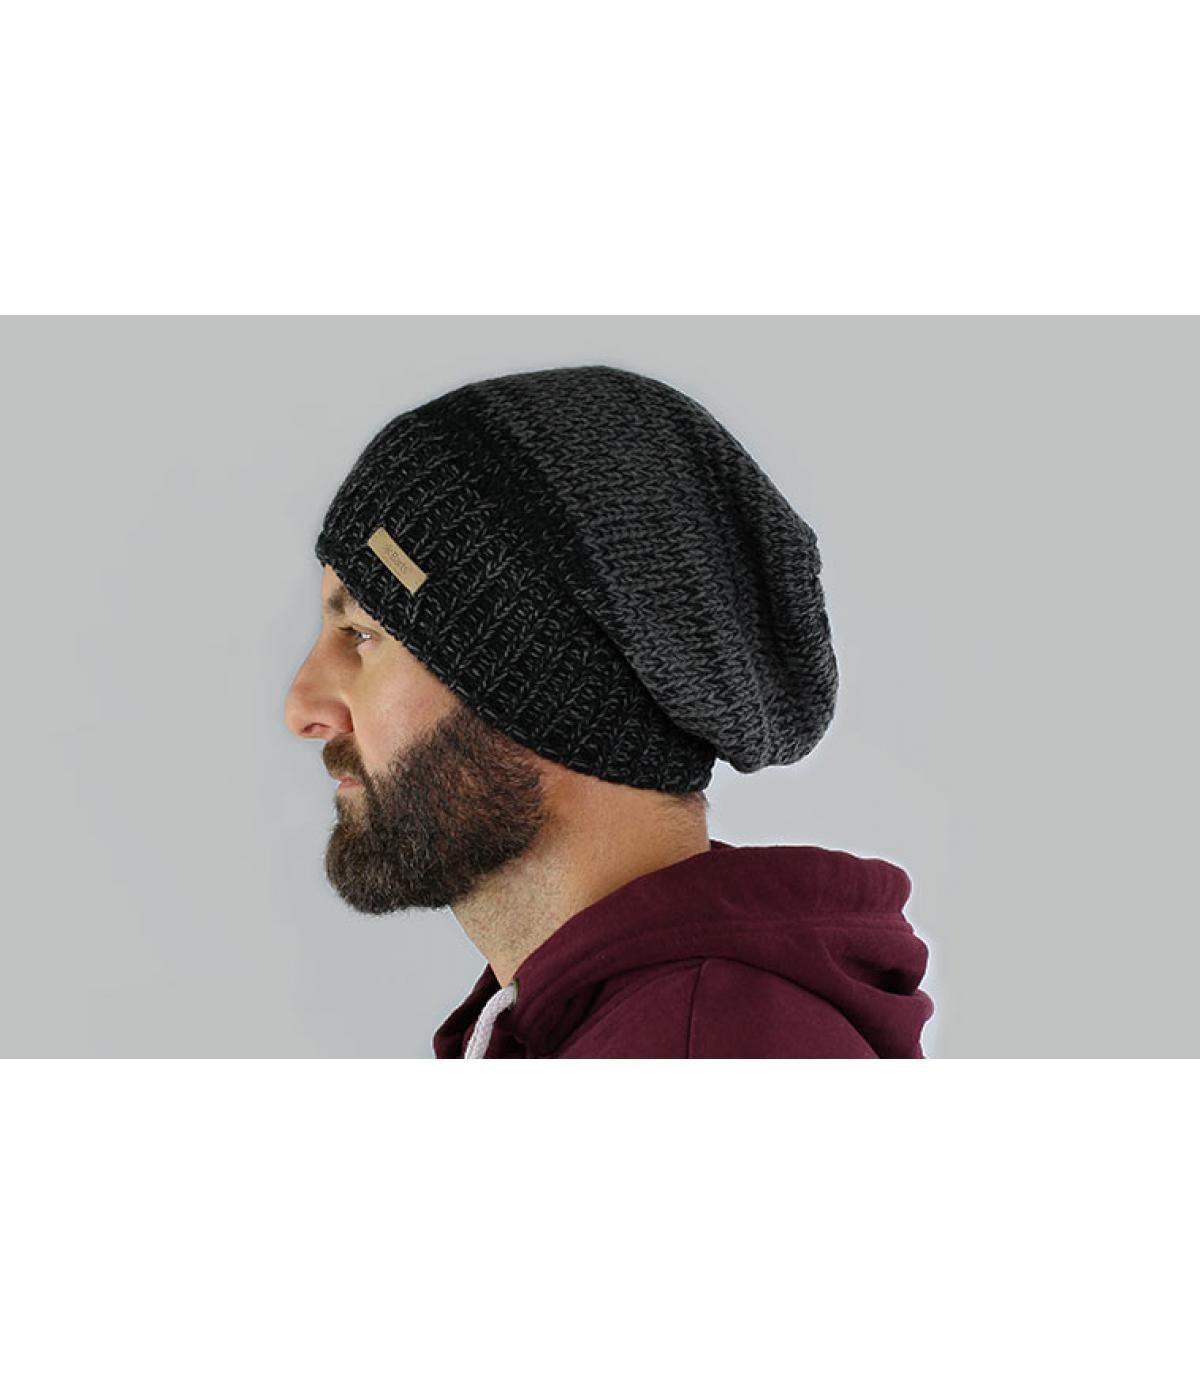 Schwarze oversize Mütze